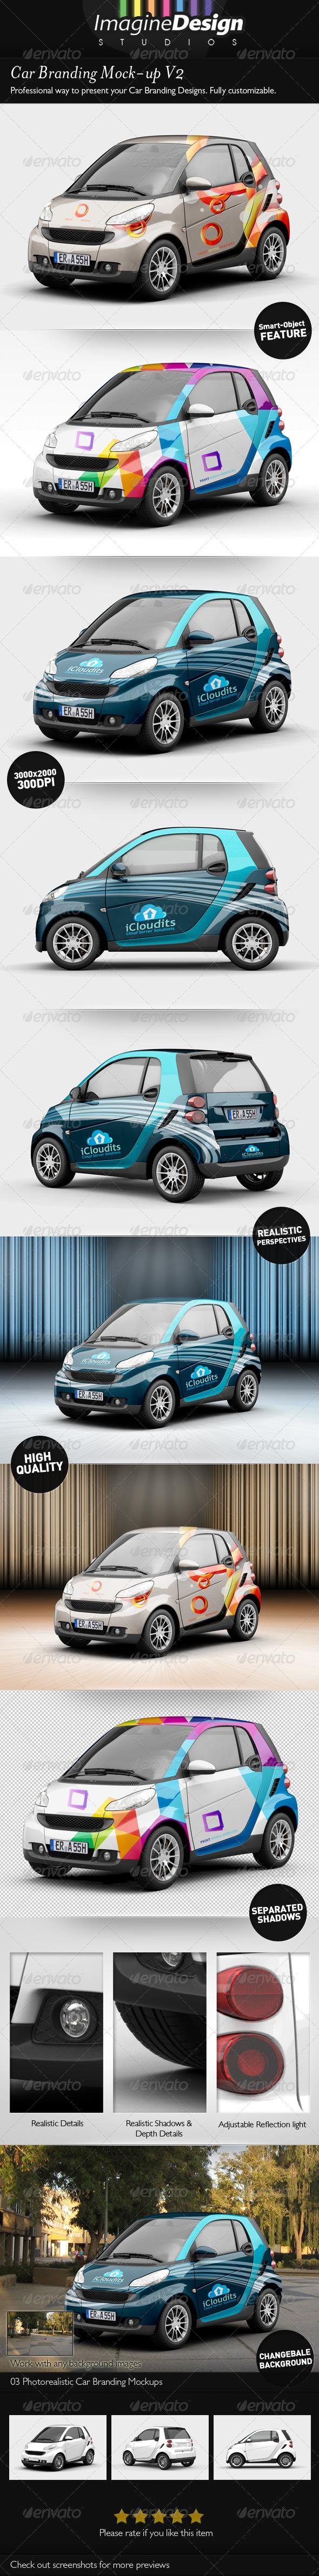 Car Branding Mock-up V2 - Vehicle Wraps Print